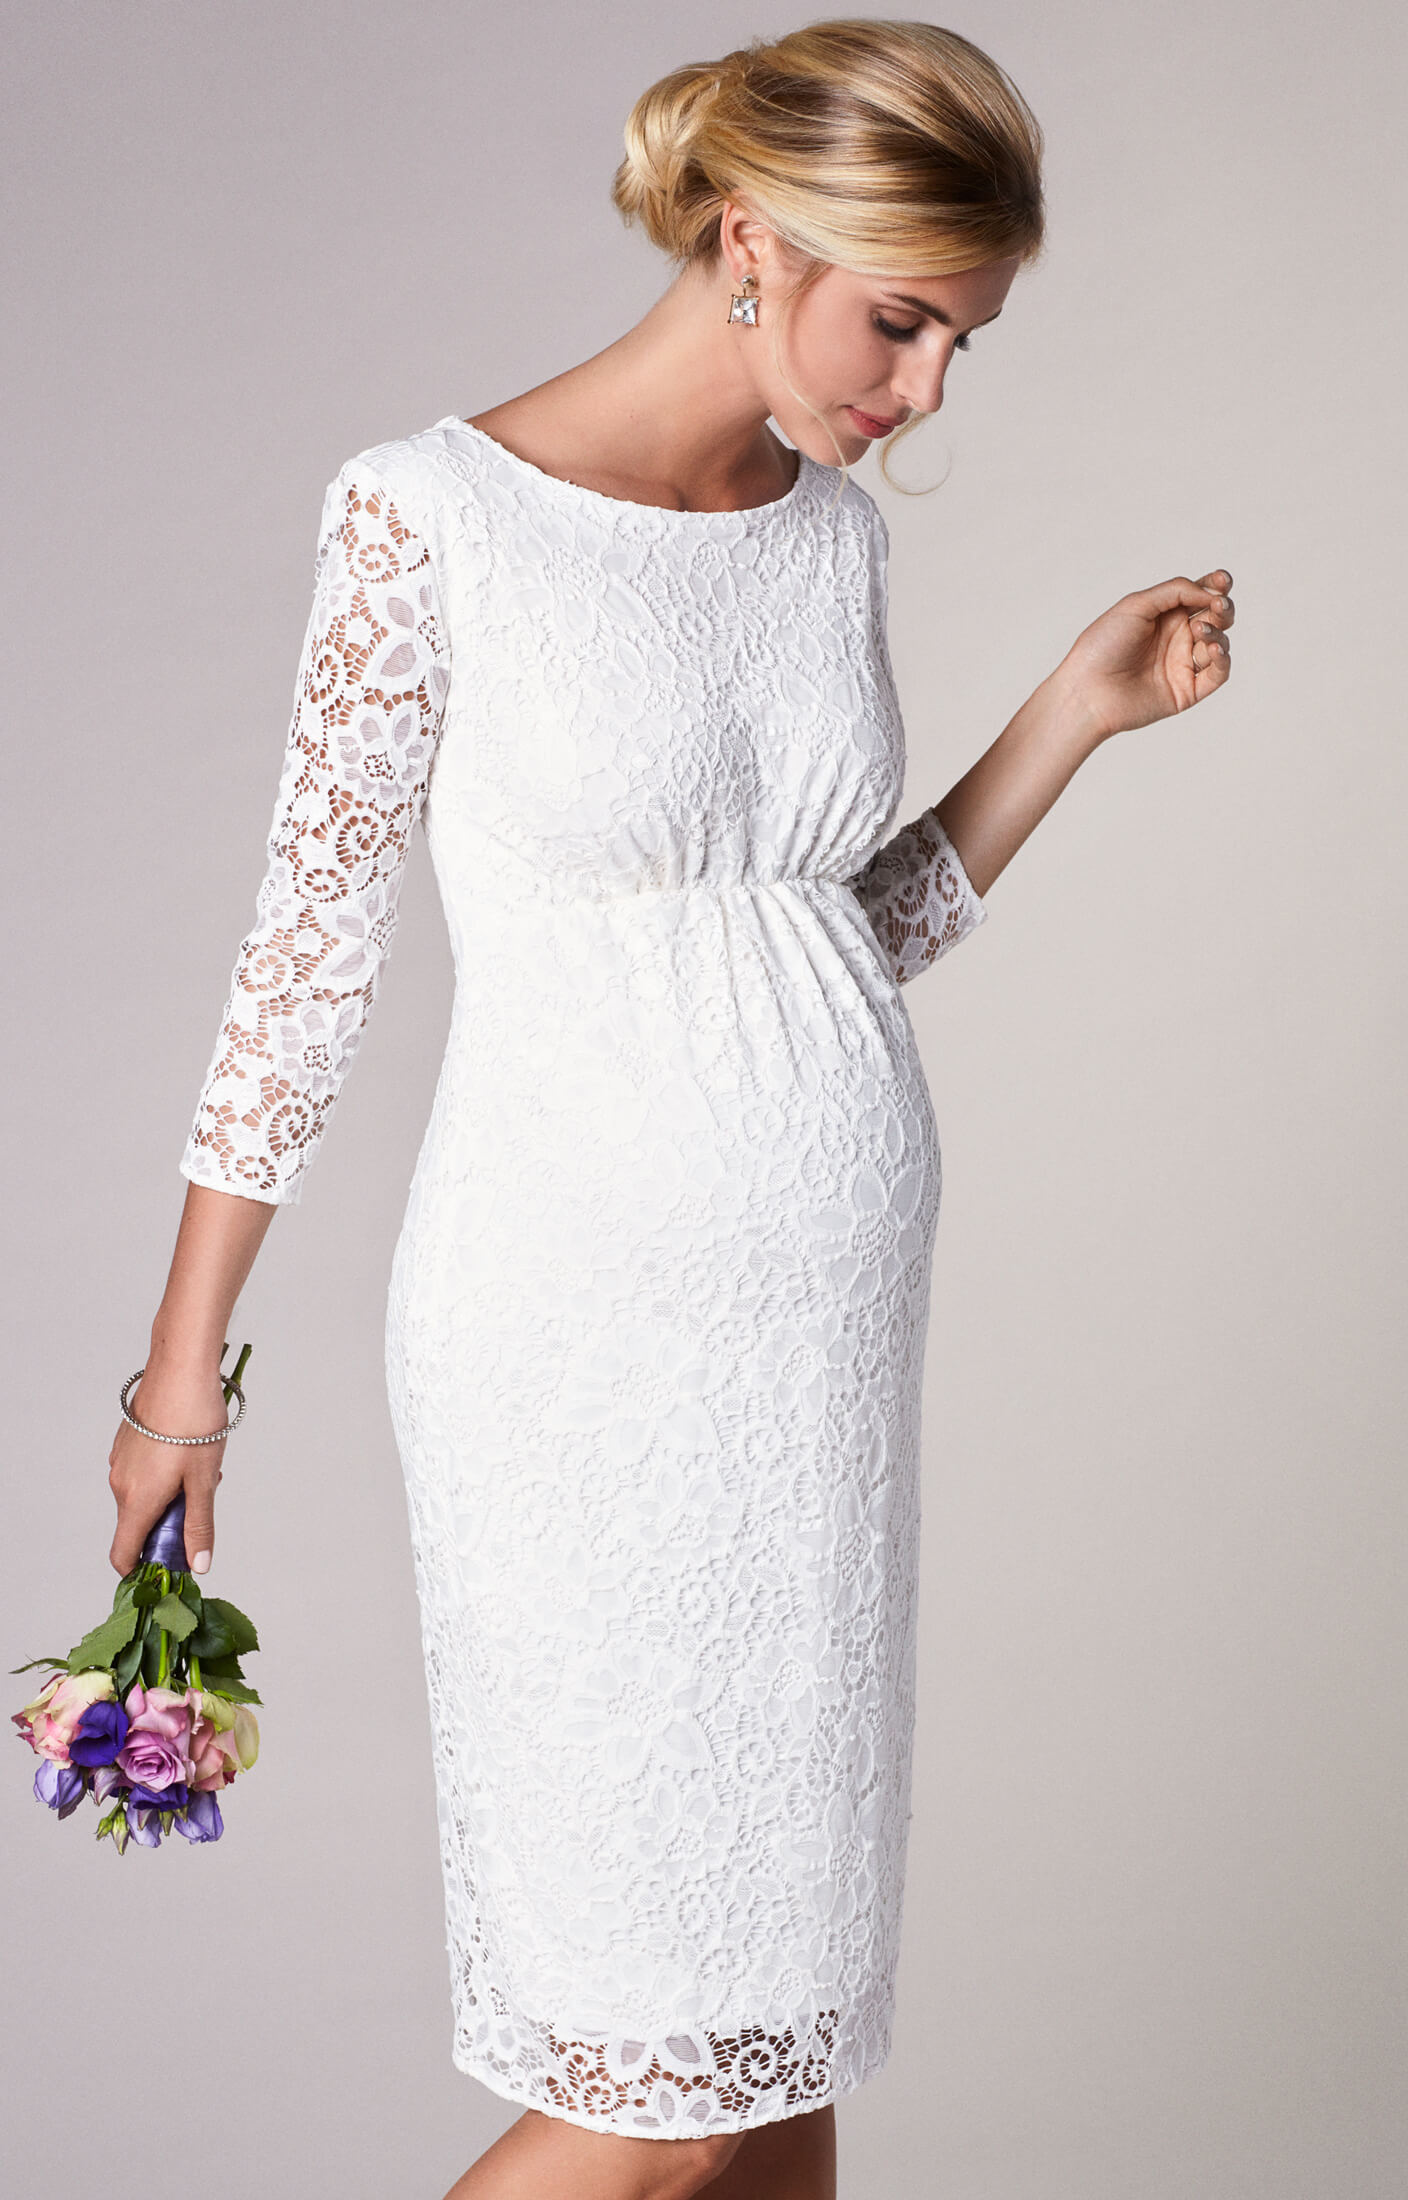 Abigail Maternity Lace Wedding Dress Ivory - Maternity Wedding ...